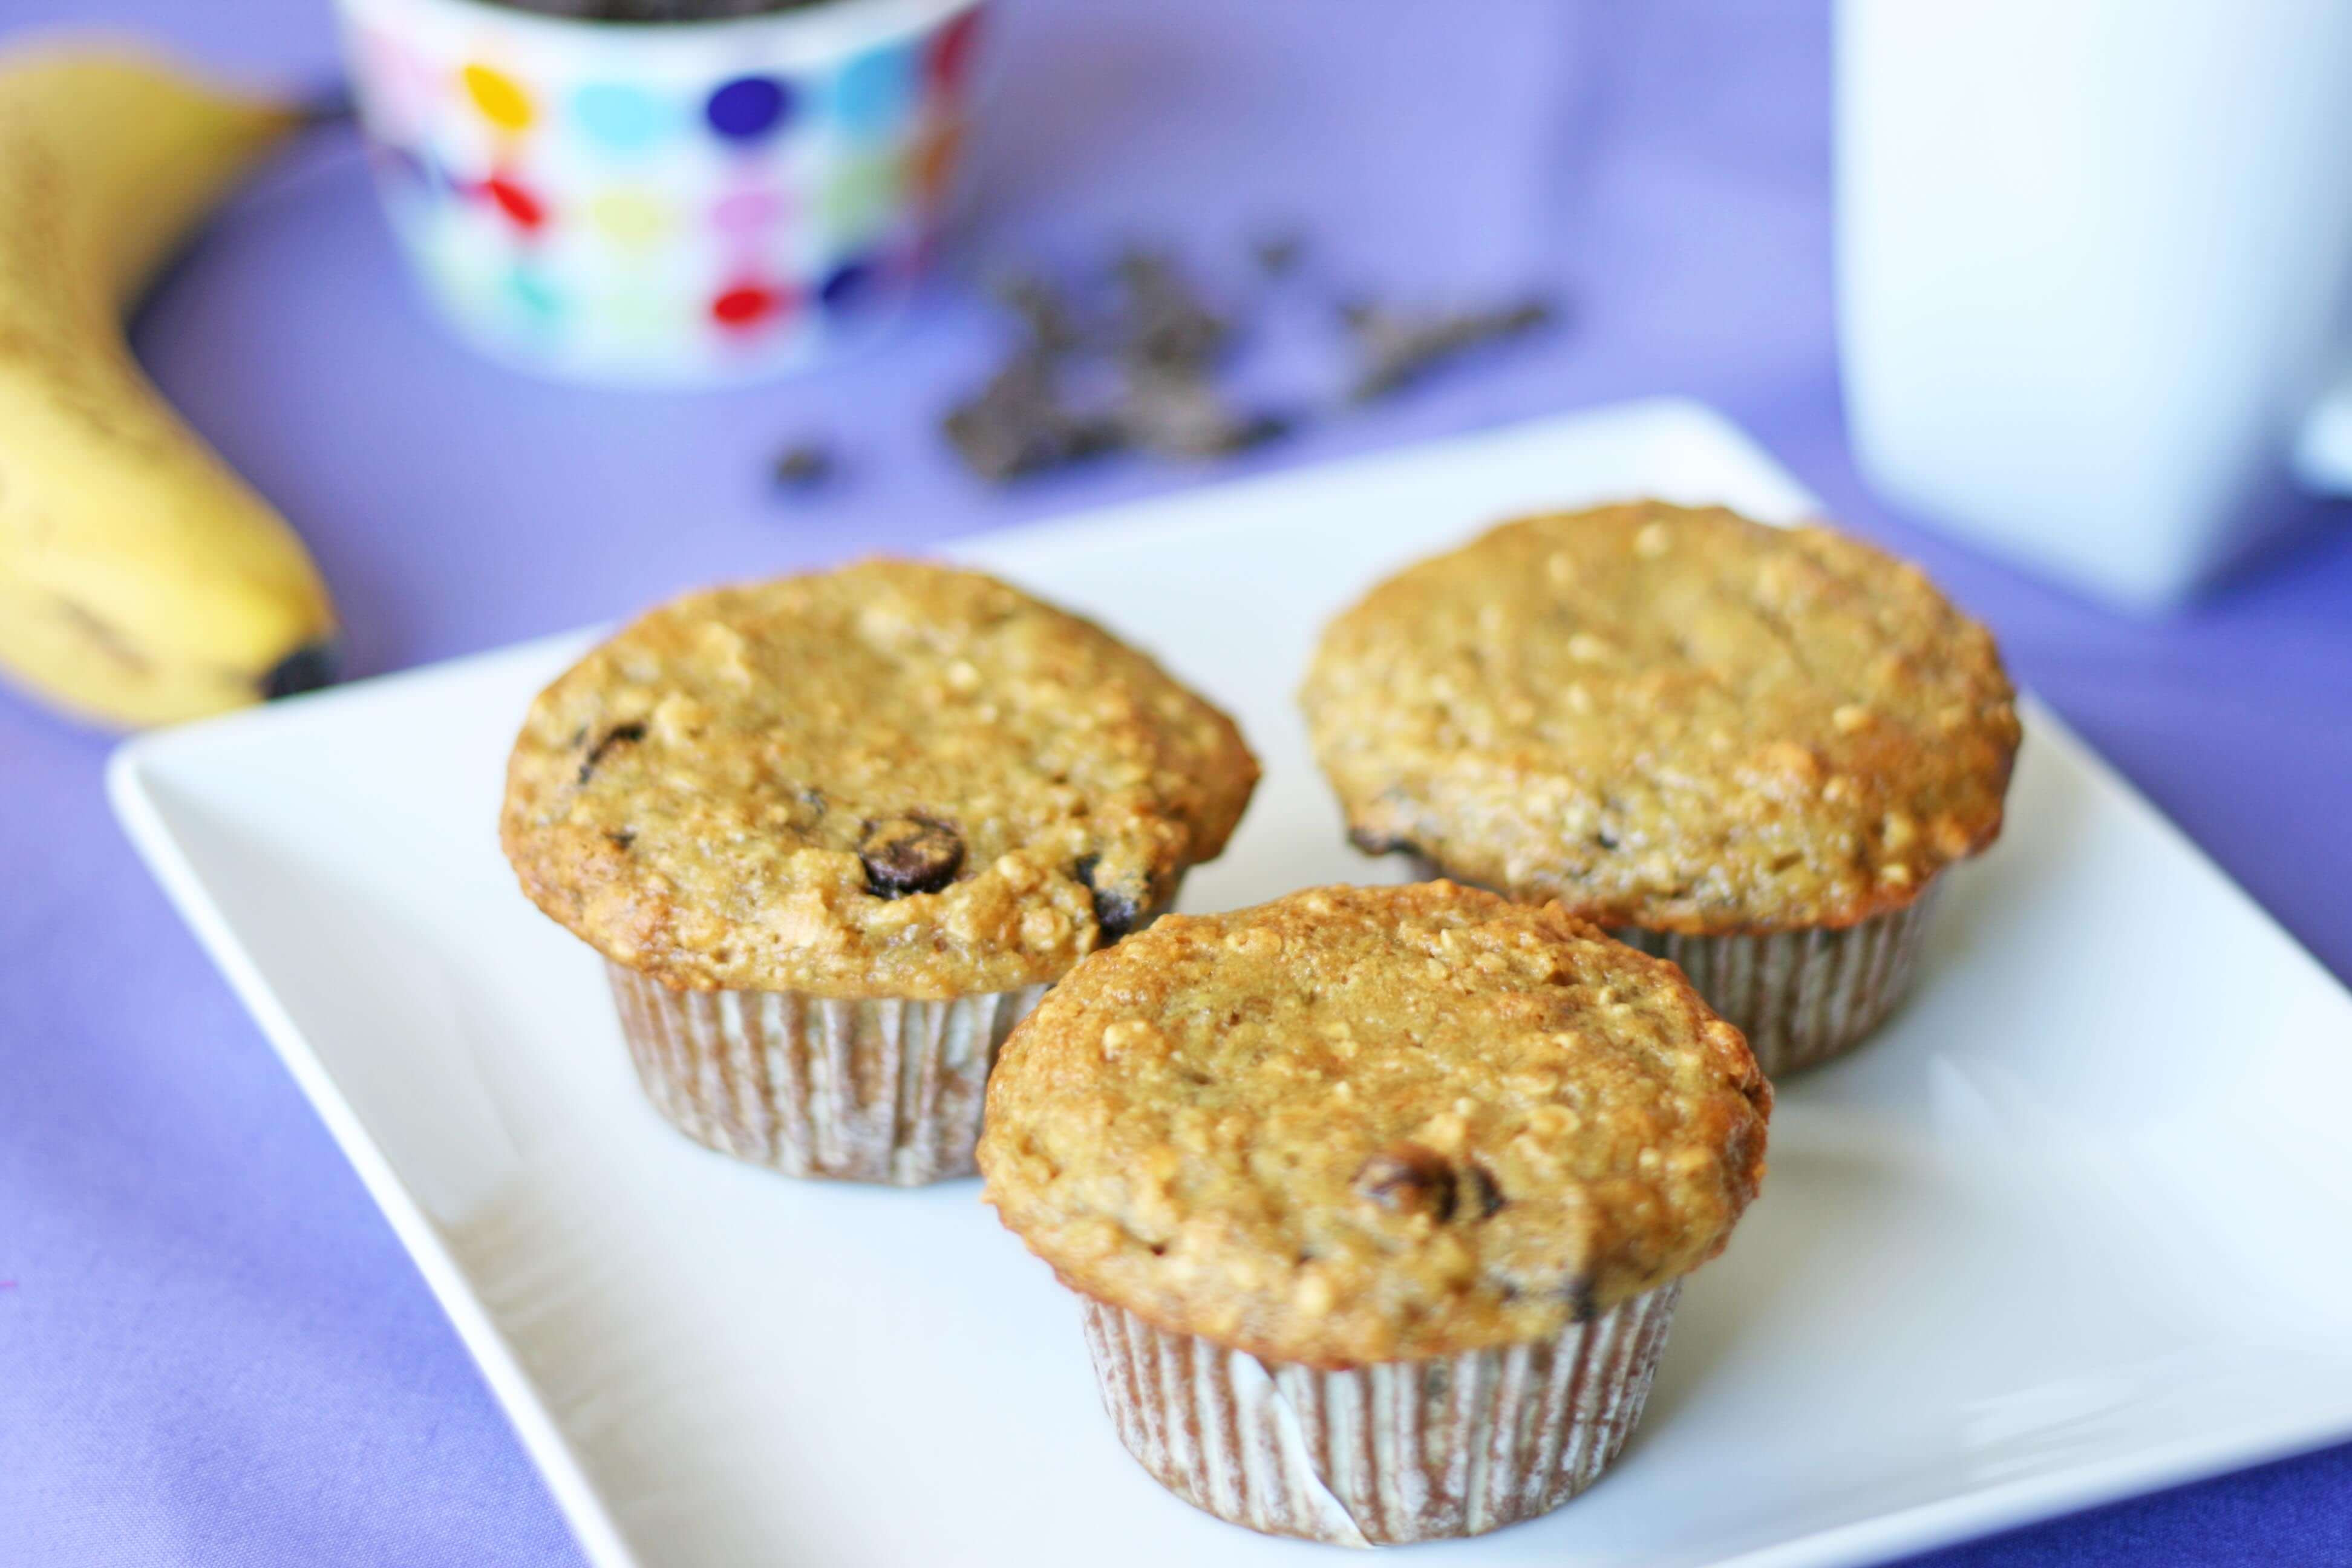 Healthy Banana Oatmeal Chocolate Chip Muffins  Oatmeal Chocolate Chip Muffins Recipe — Dishmaps